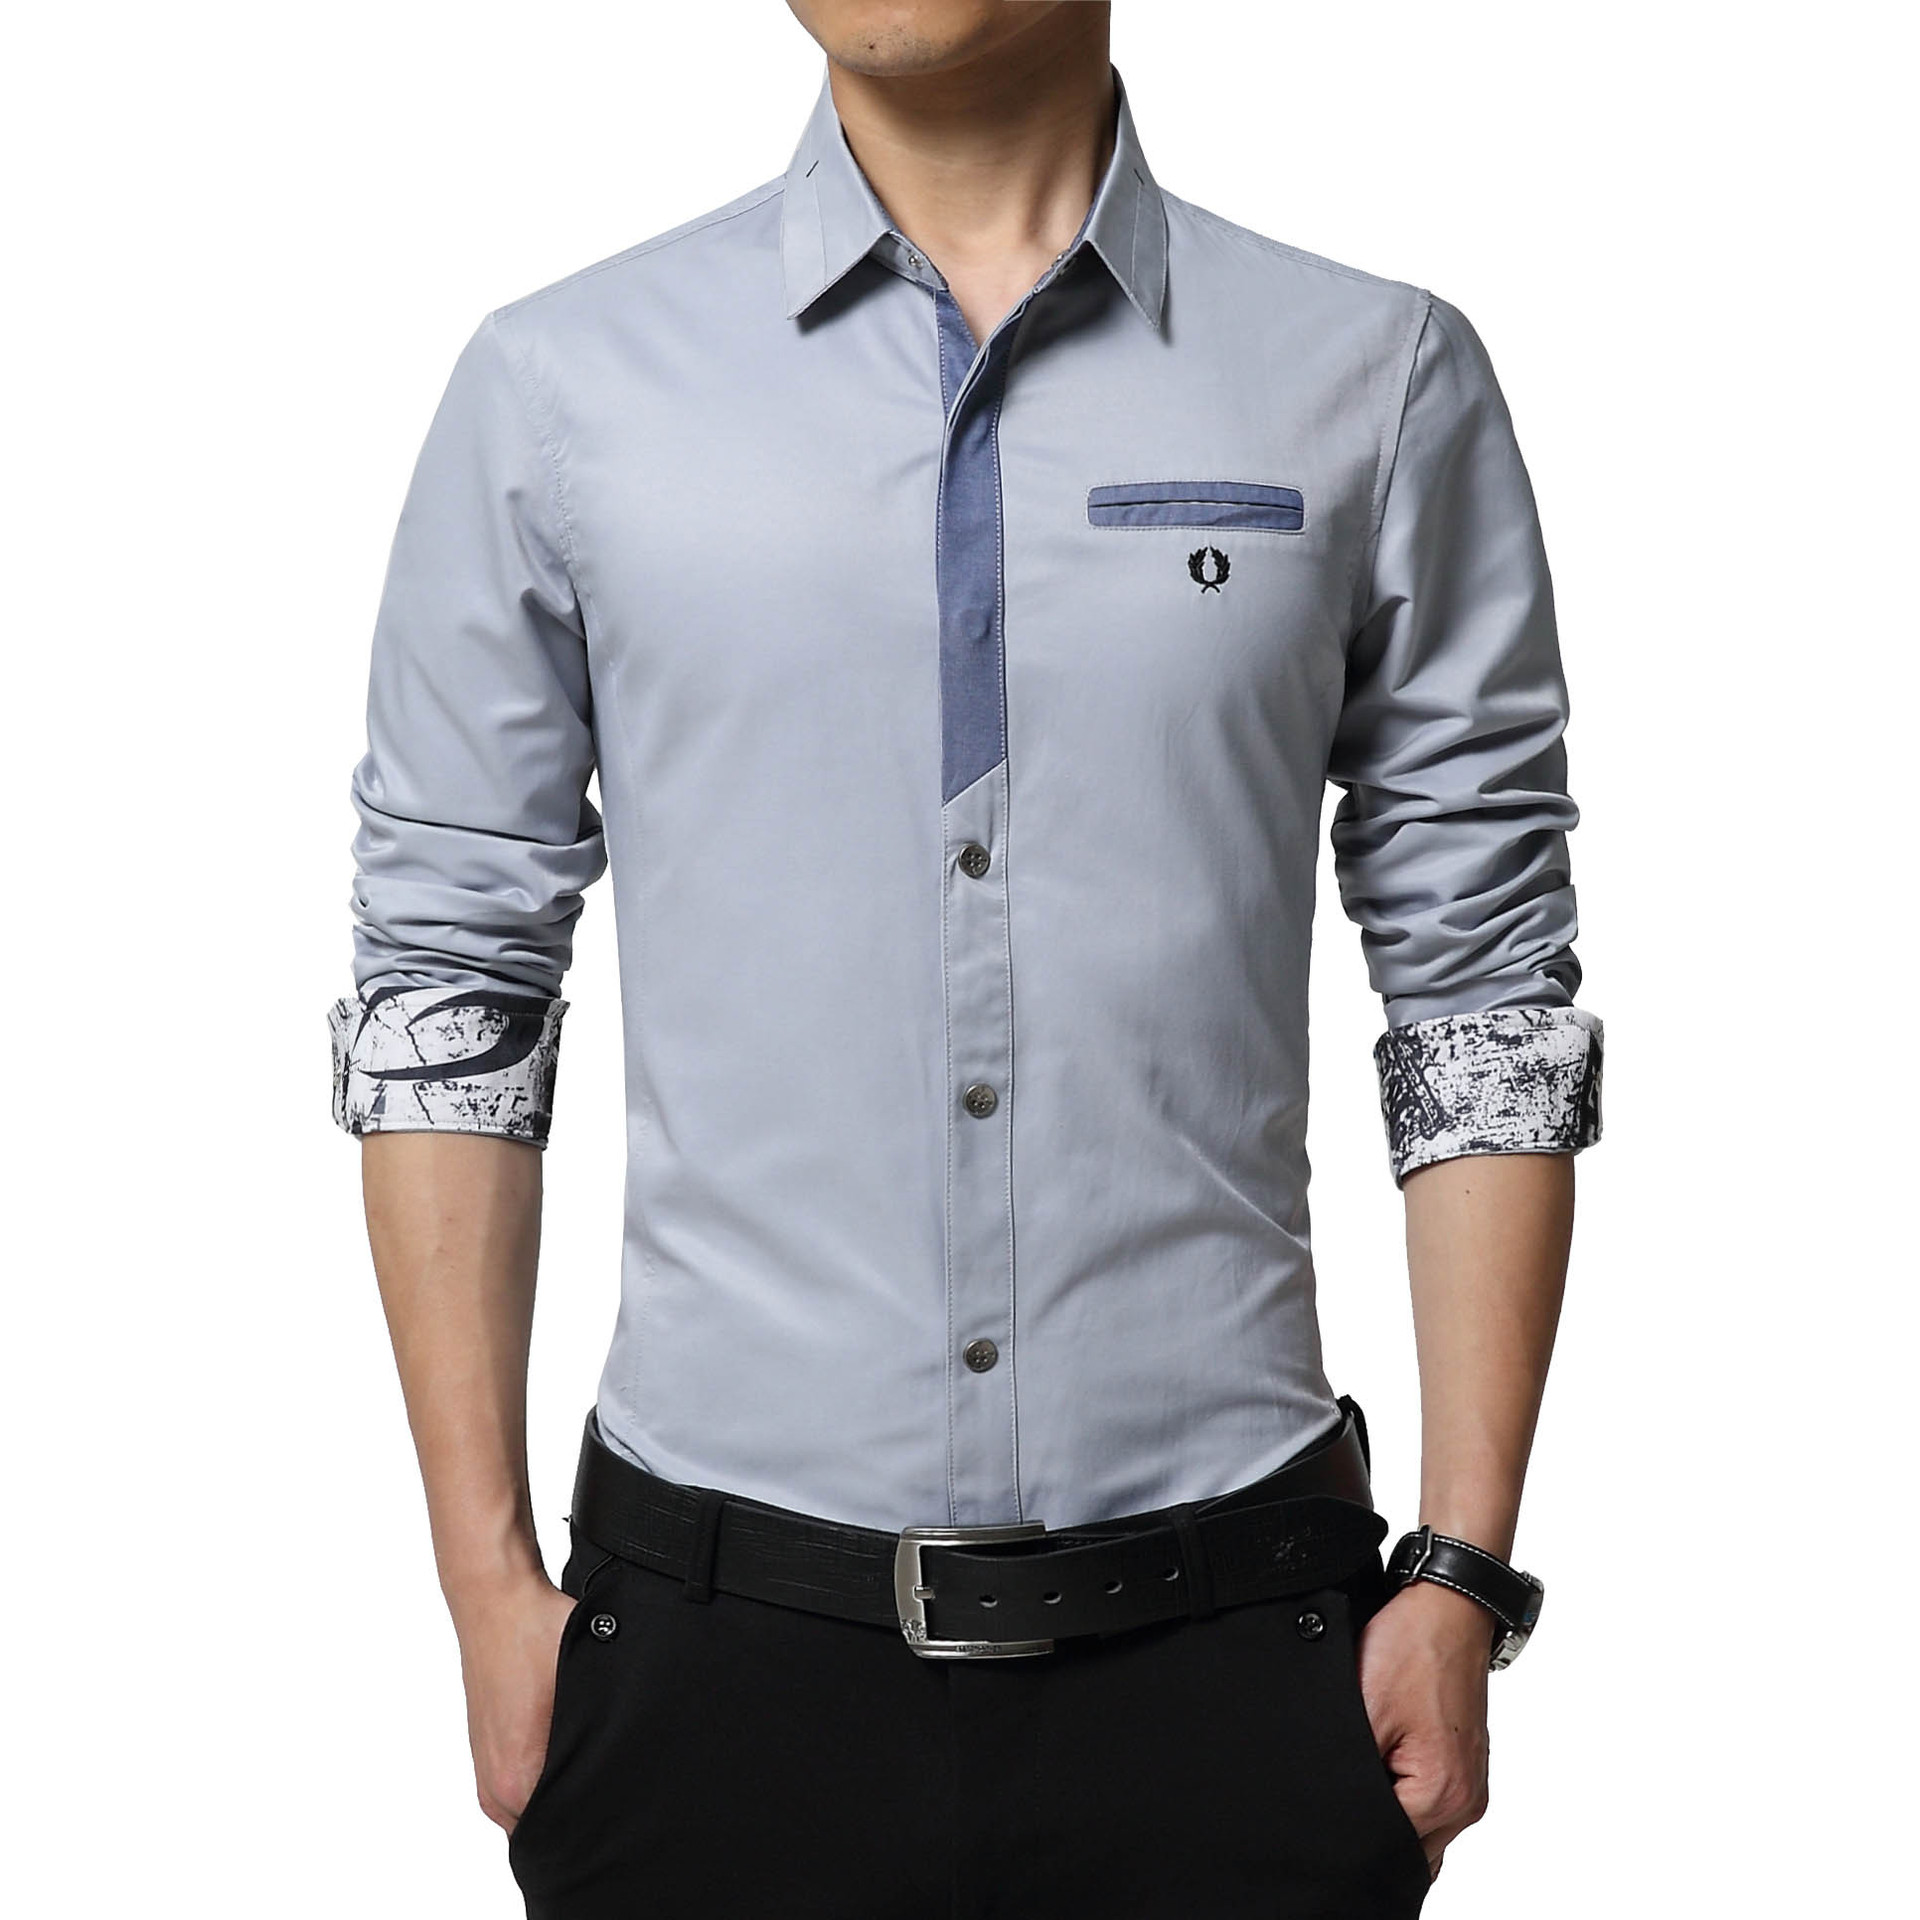 Floral Print Striped Dress Men Shirt Uniform Mens Long Sleeve Slim Fit Top Vintage Cotton Button Down Shirts Camisa Masculina 38